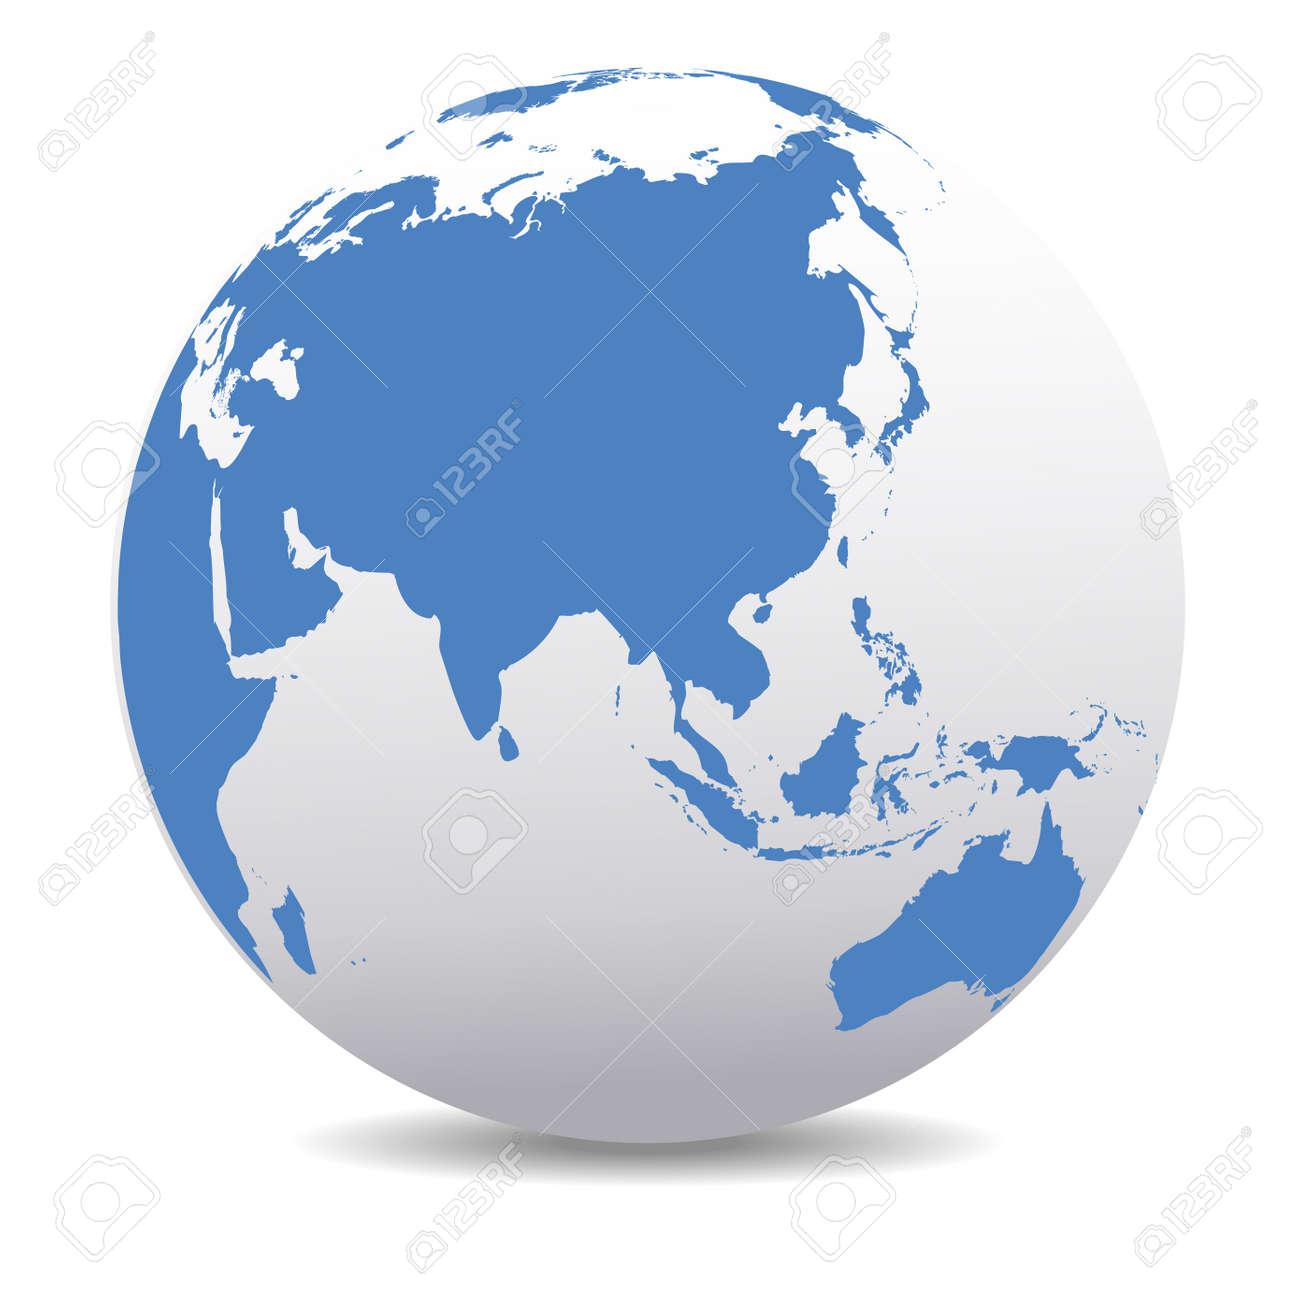 China and Asia, Global World - 33238196